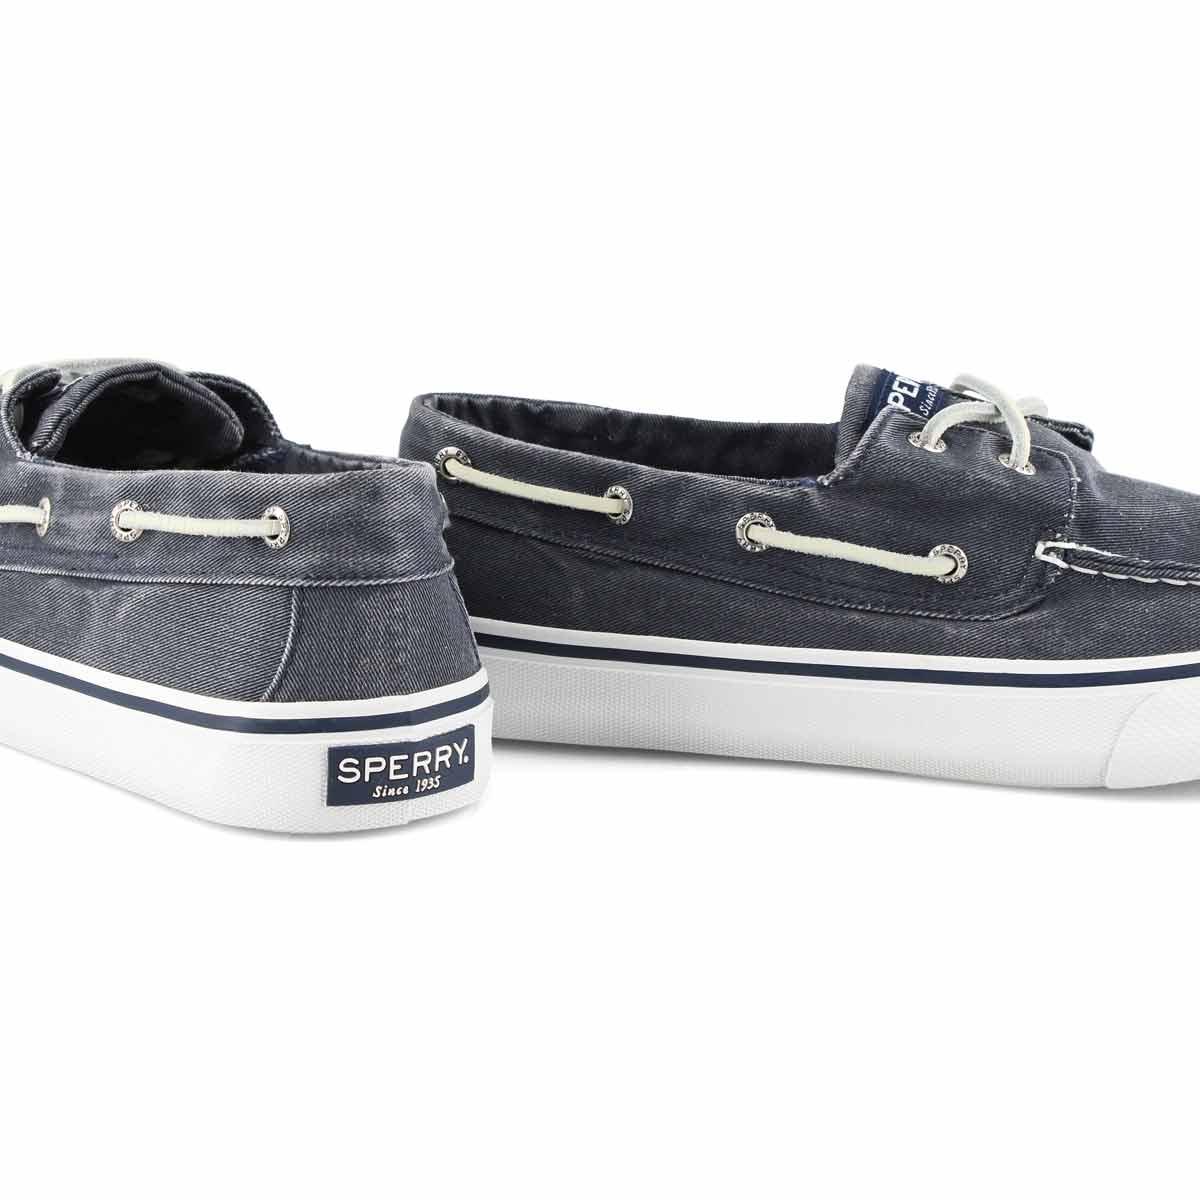 Mns Bahama II navy boat shoe